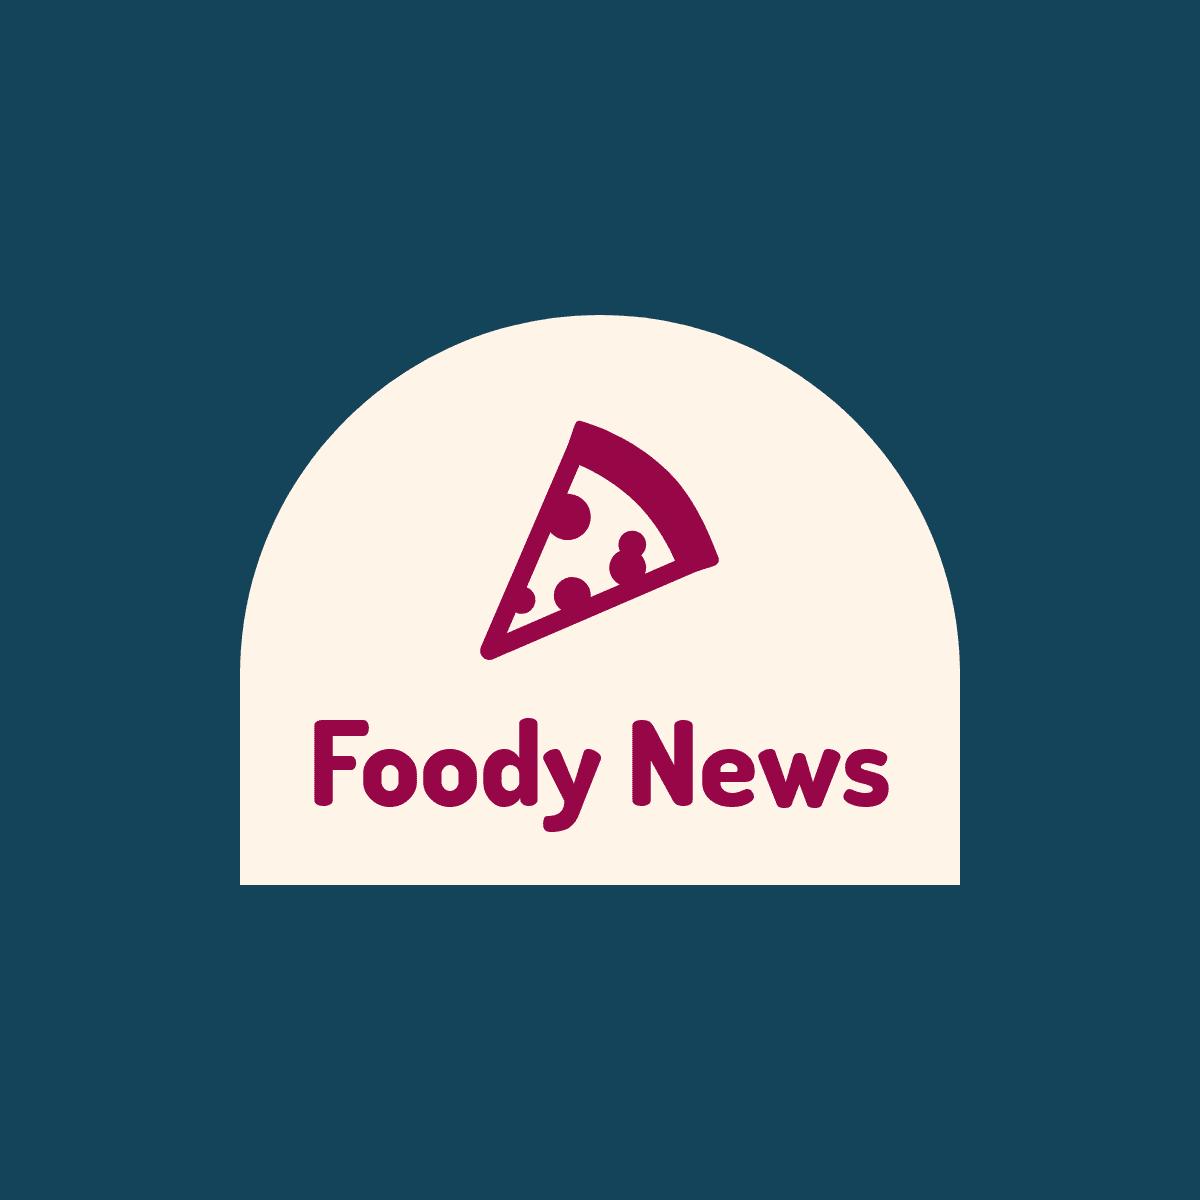 Foody.news